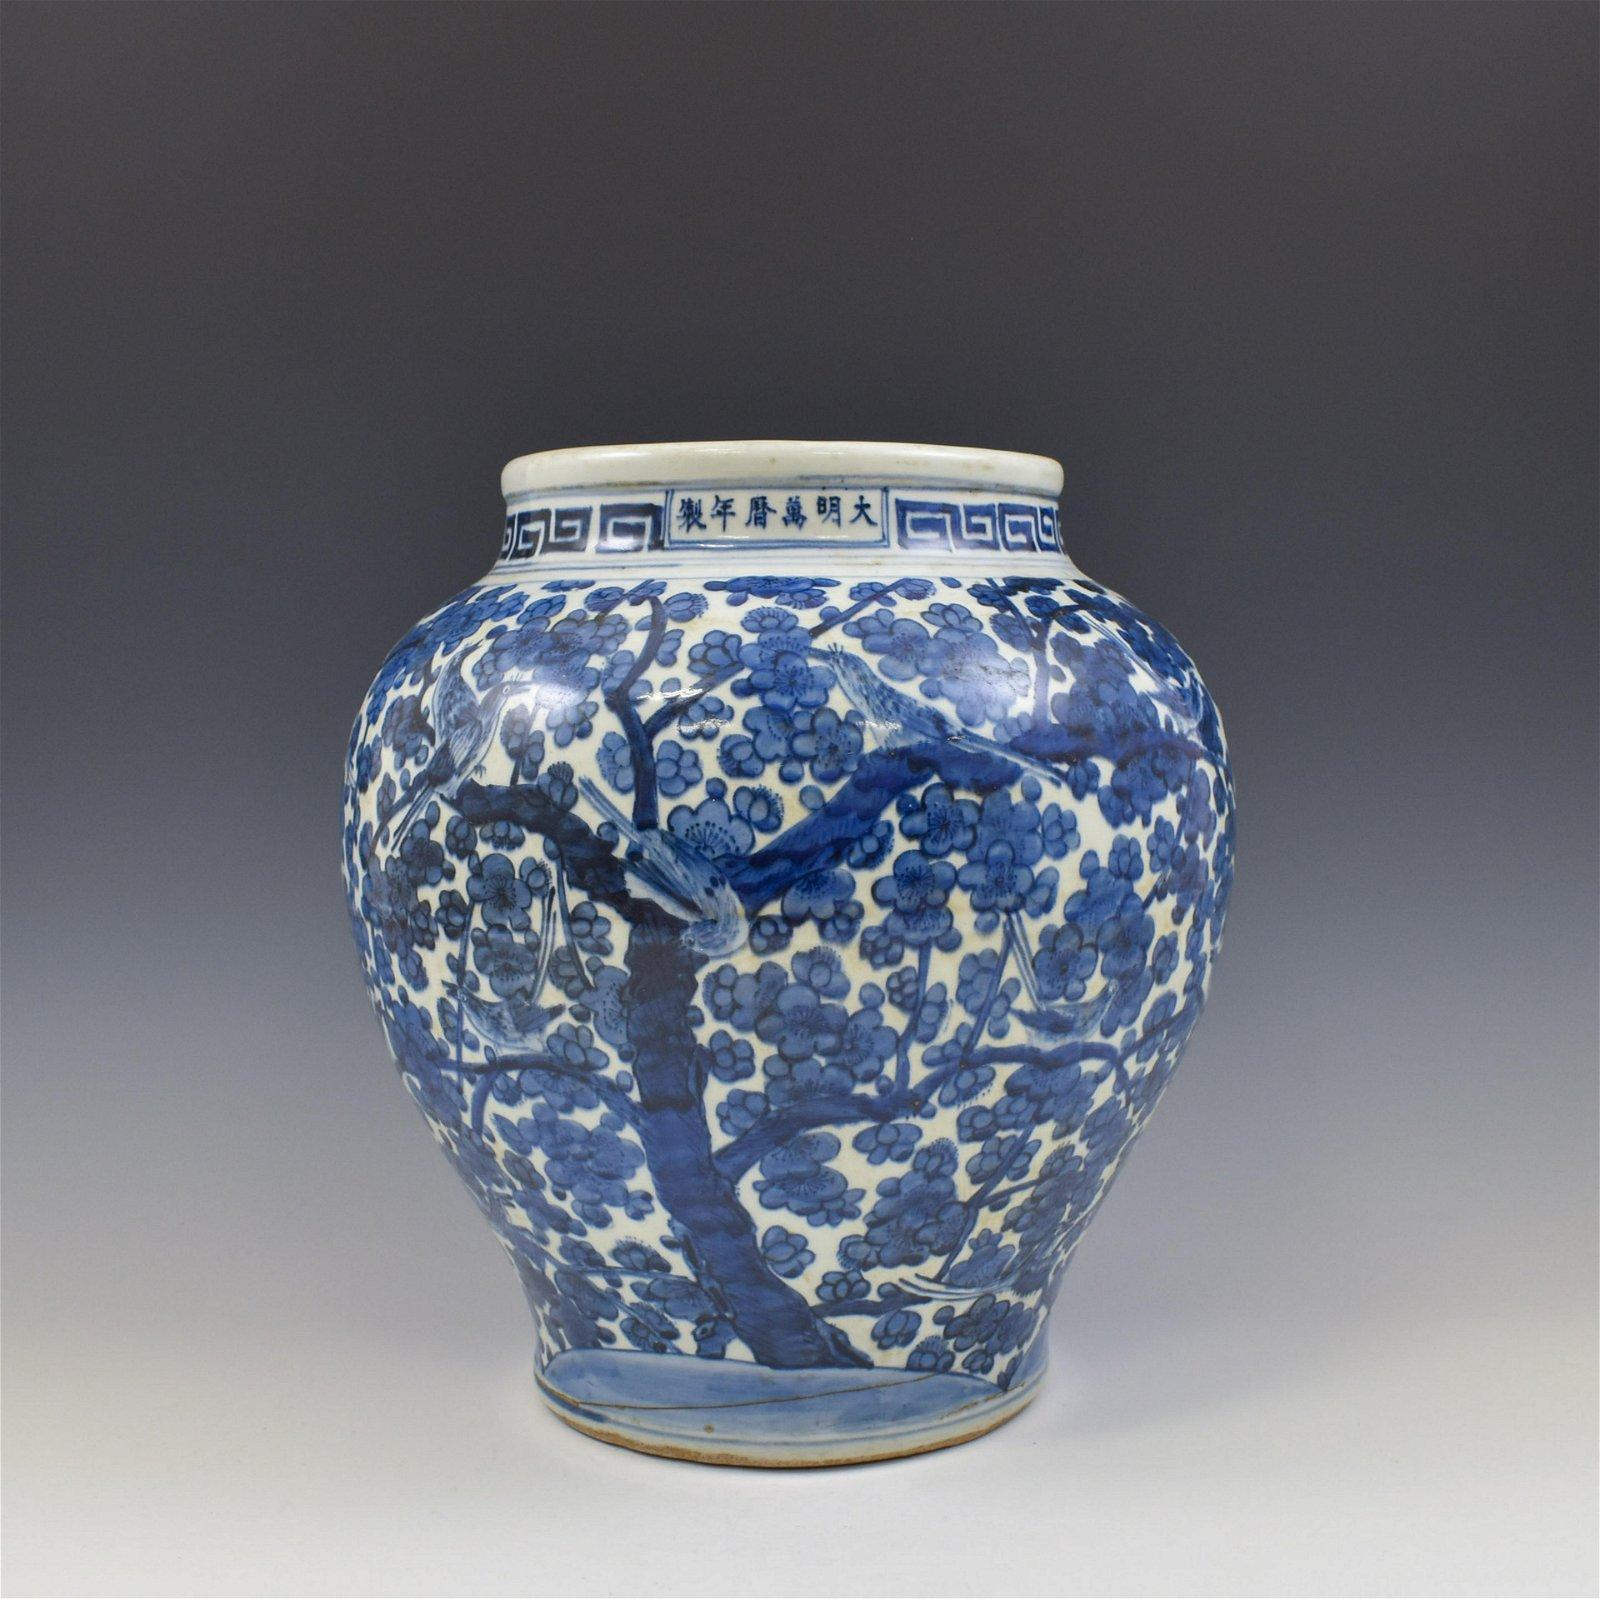 WANLI BLUE & WHITE MAGPIE & PRUNUS JAR